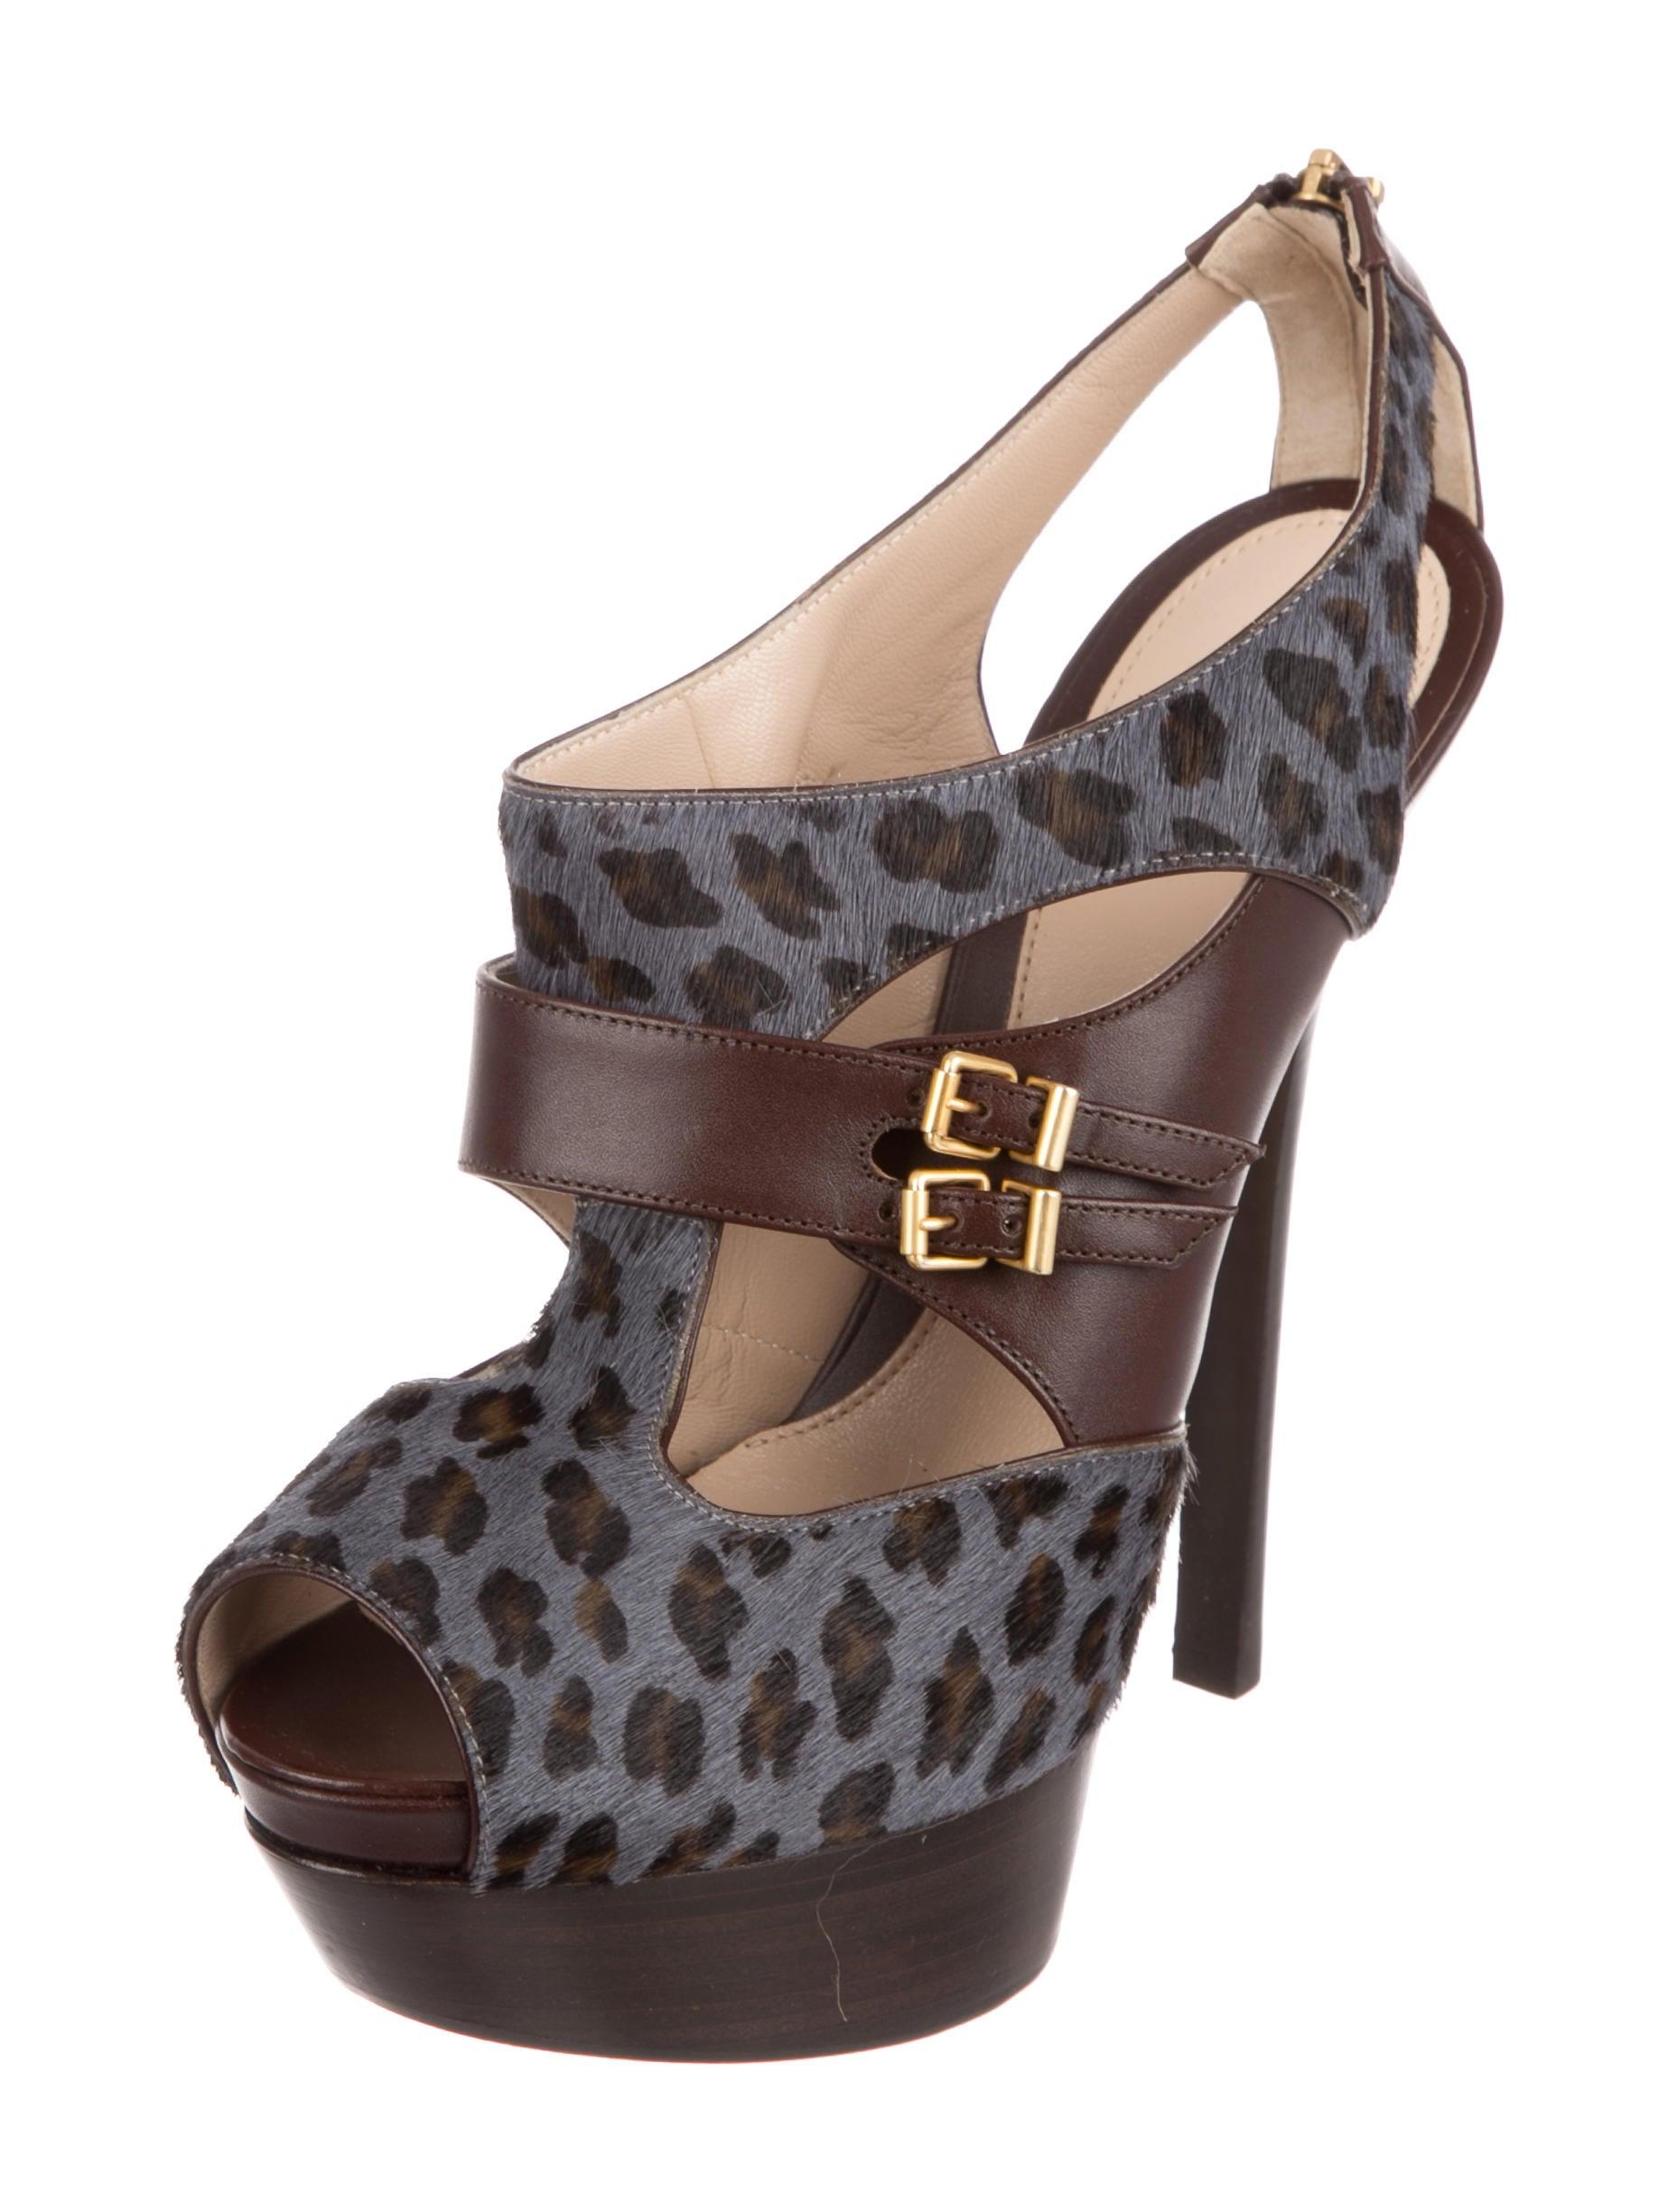 Fendi Animal Print Platform Sandals w/ Tags cheap sale latest collections pH4TtKGH